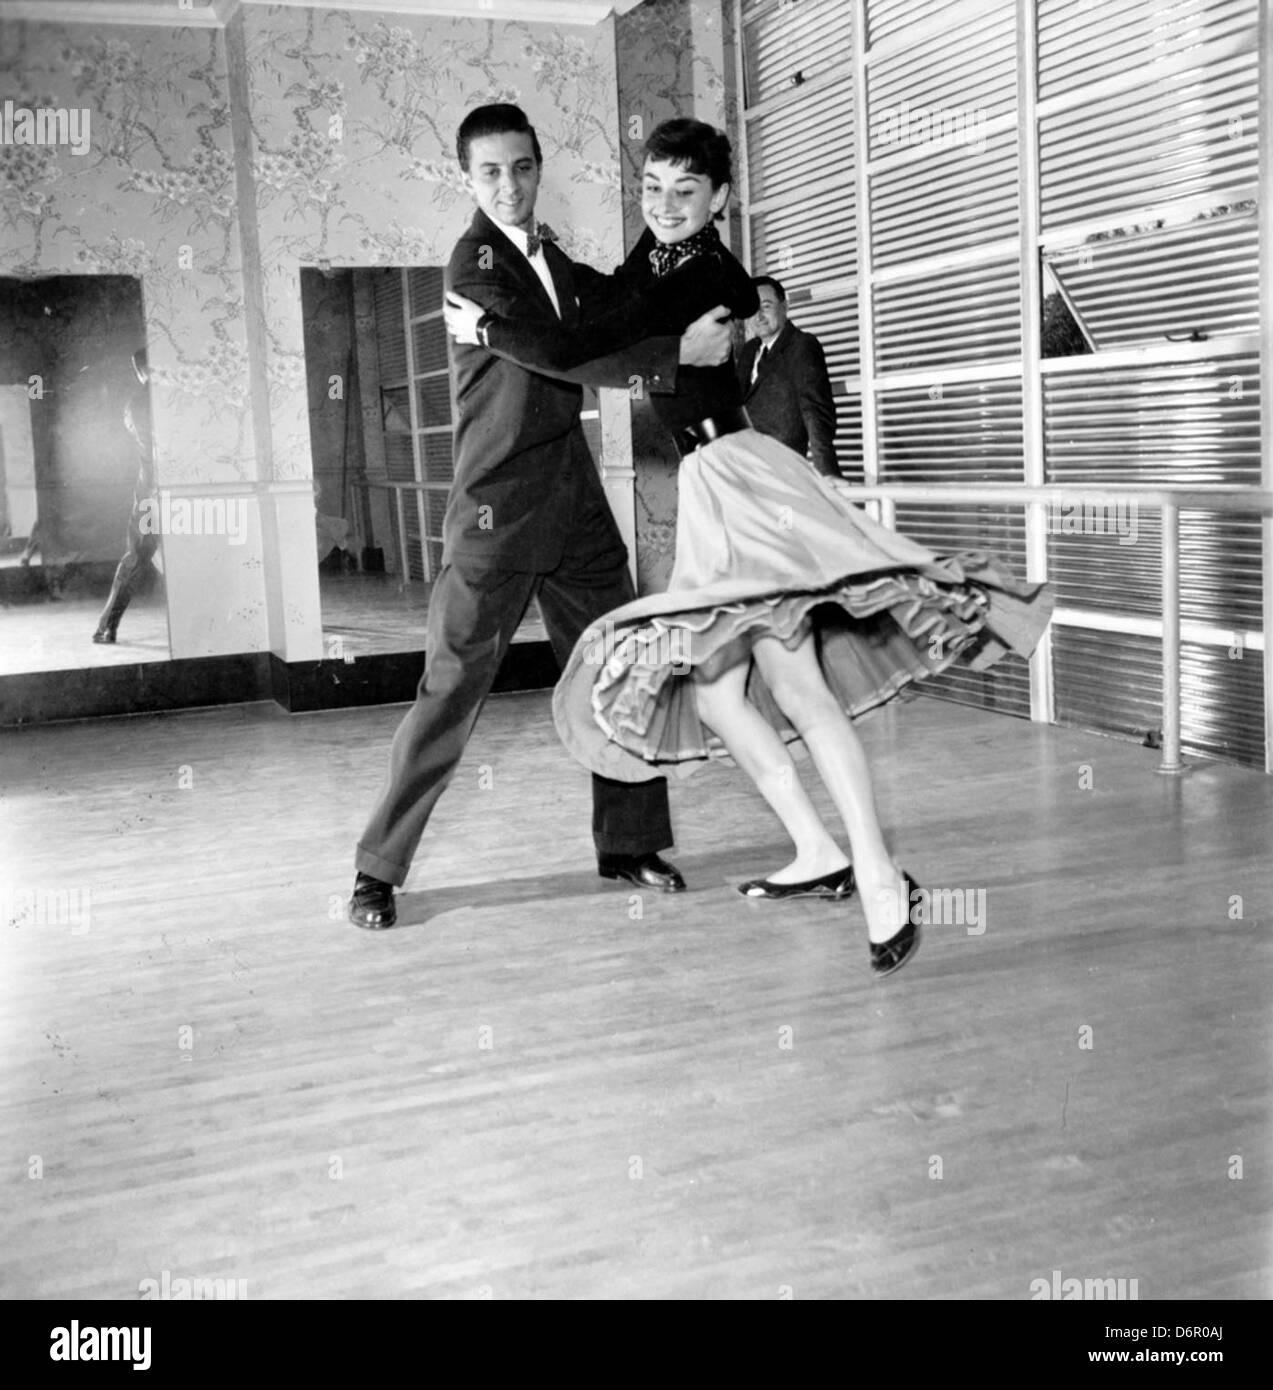 Audrey Hepburn and dancing partner by Earl Theisen, 1954 - Stock Image